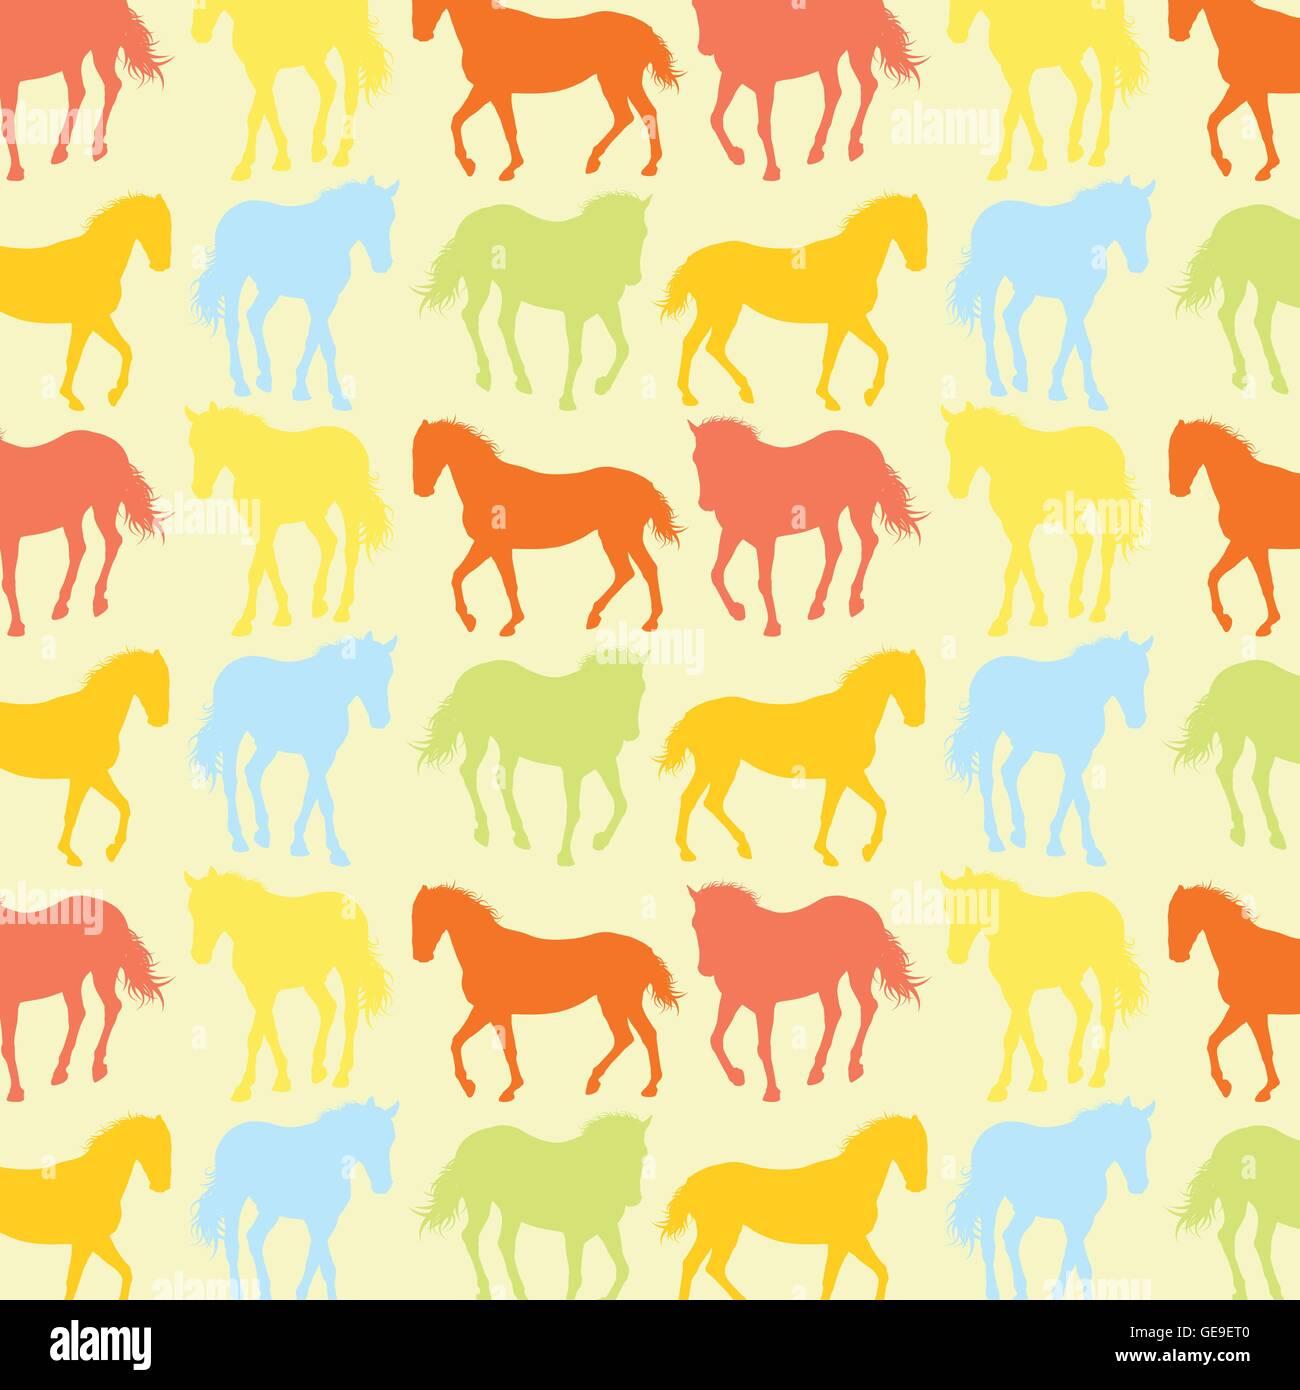 Horses Pattern Vector Background Wallpaper Concept Illustration Stock Vector Image Art Alamy